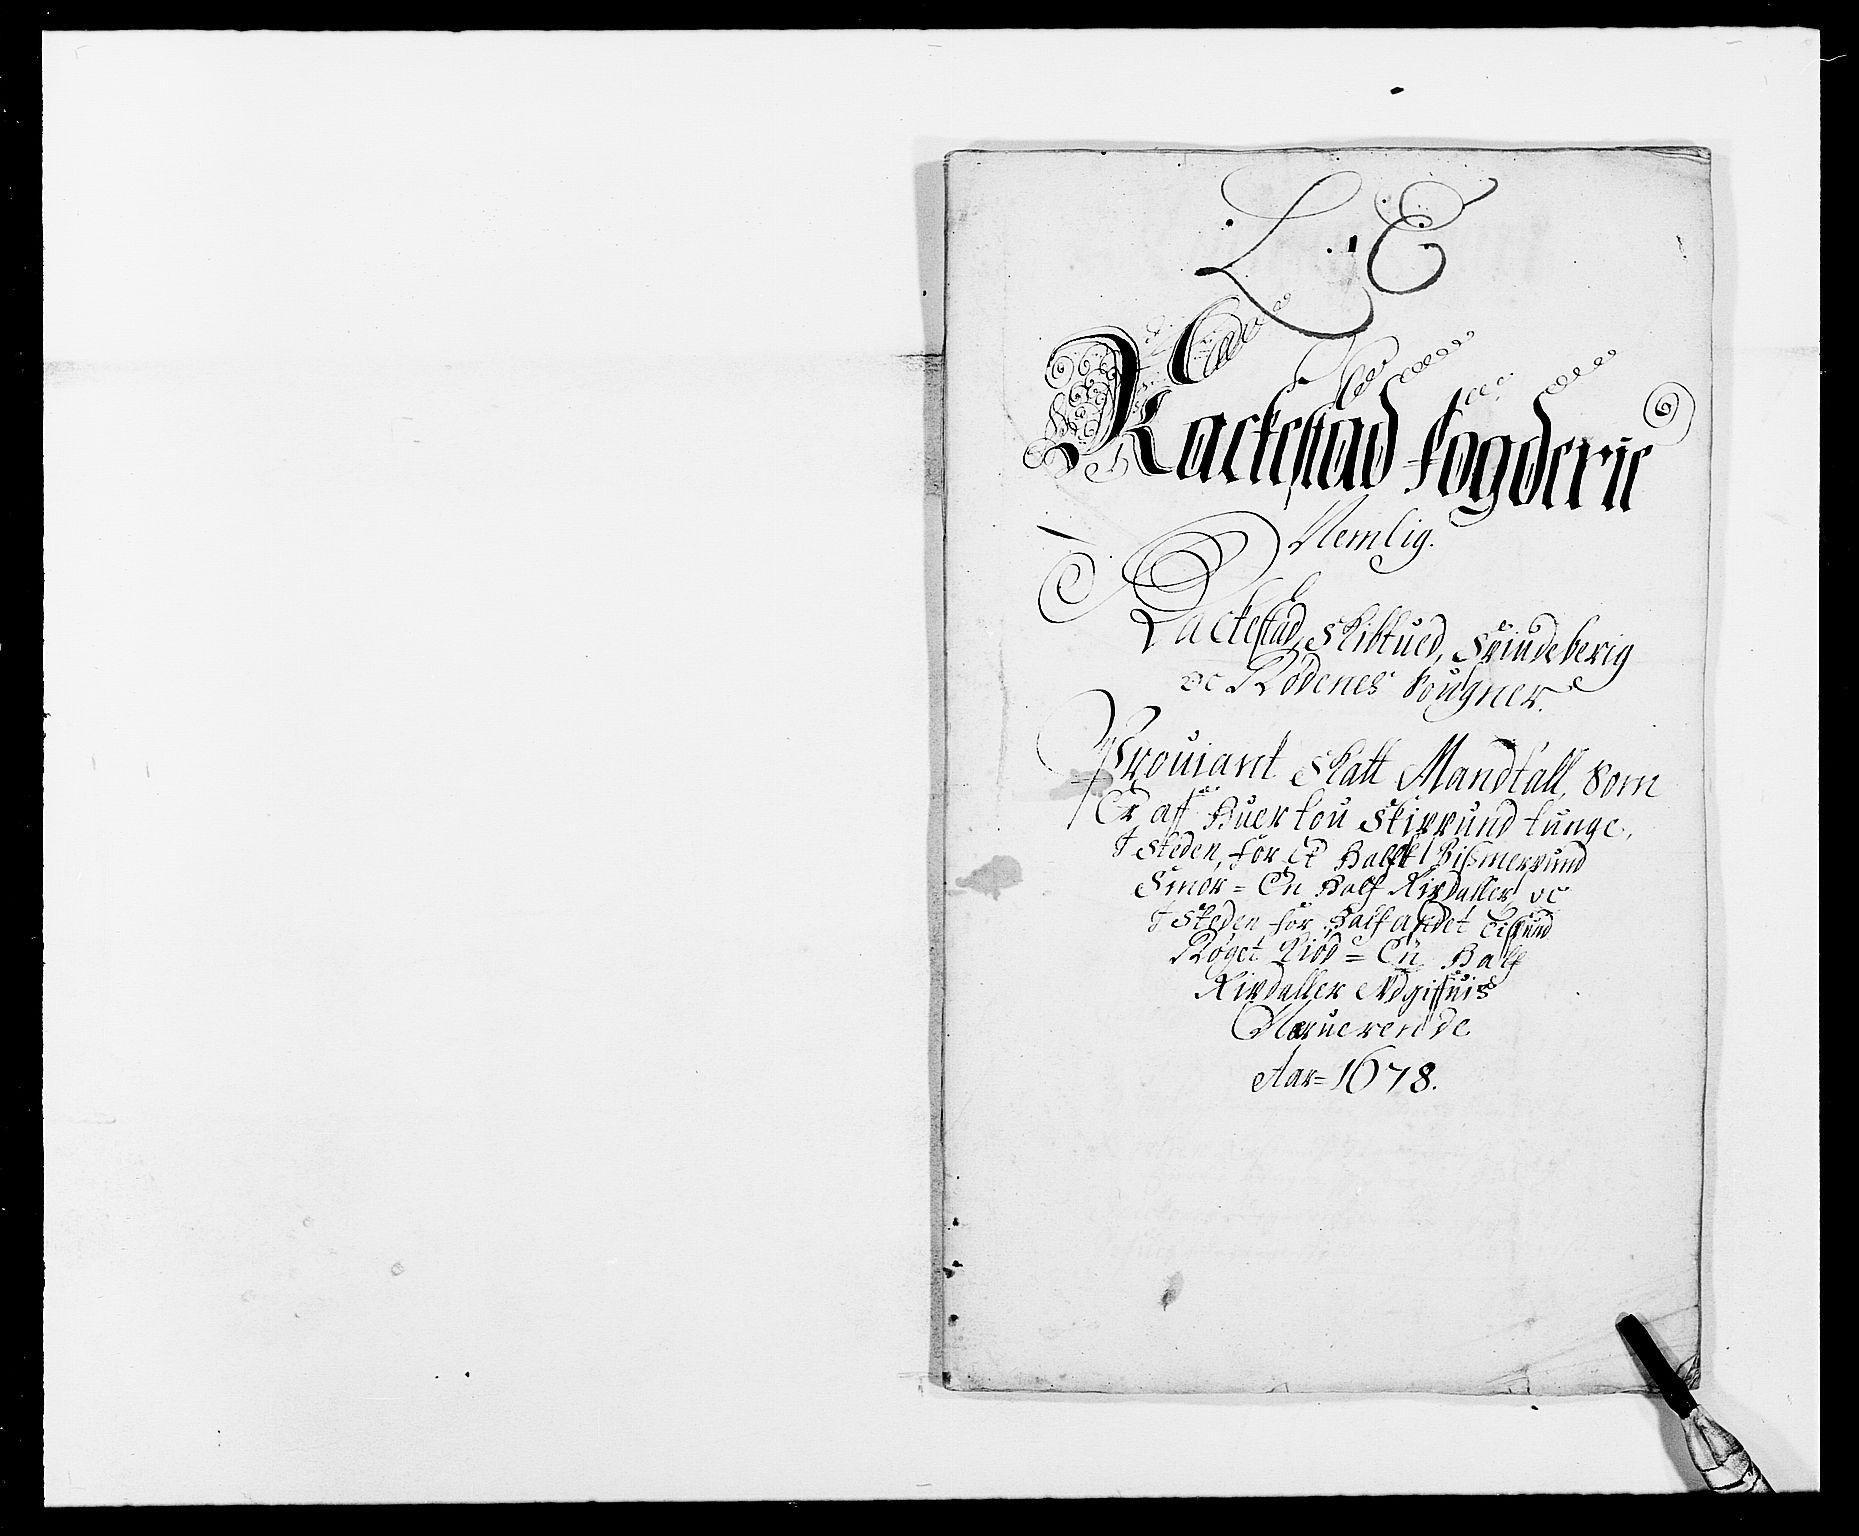 RA, Rentekammeret inntil 1814, Reviderte regnskaper, Fogderegnskap, R05/L0271: Fogderegnskap Rakkestad, 1678-1679, s. 120